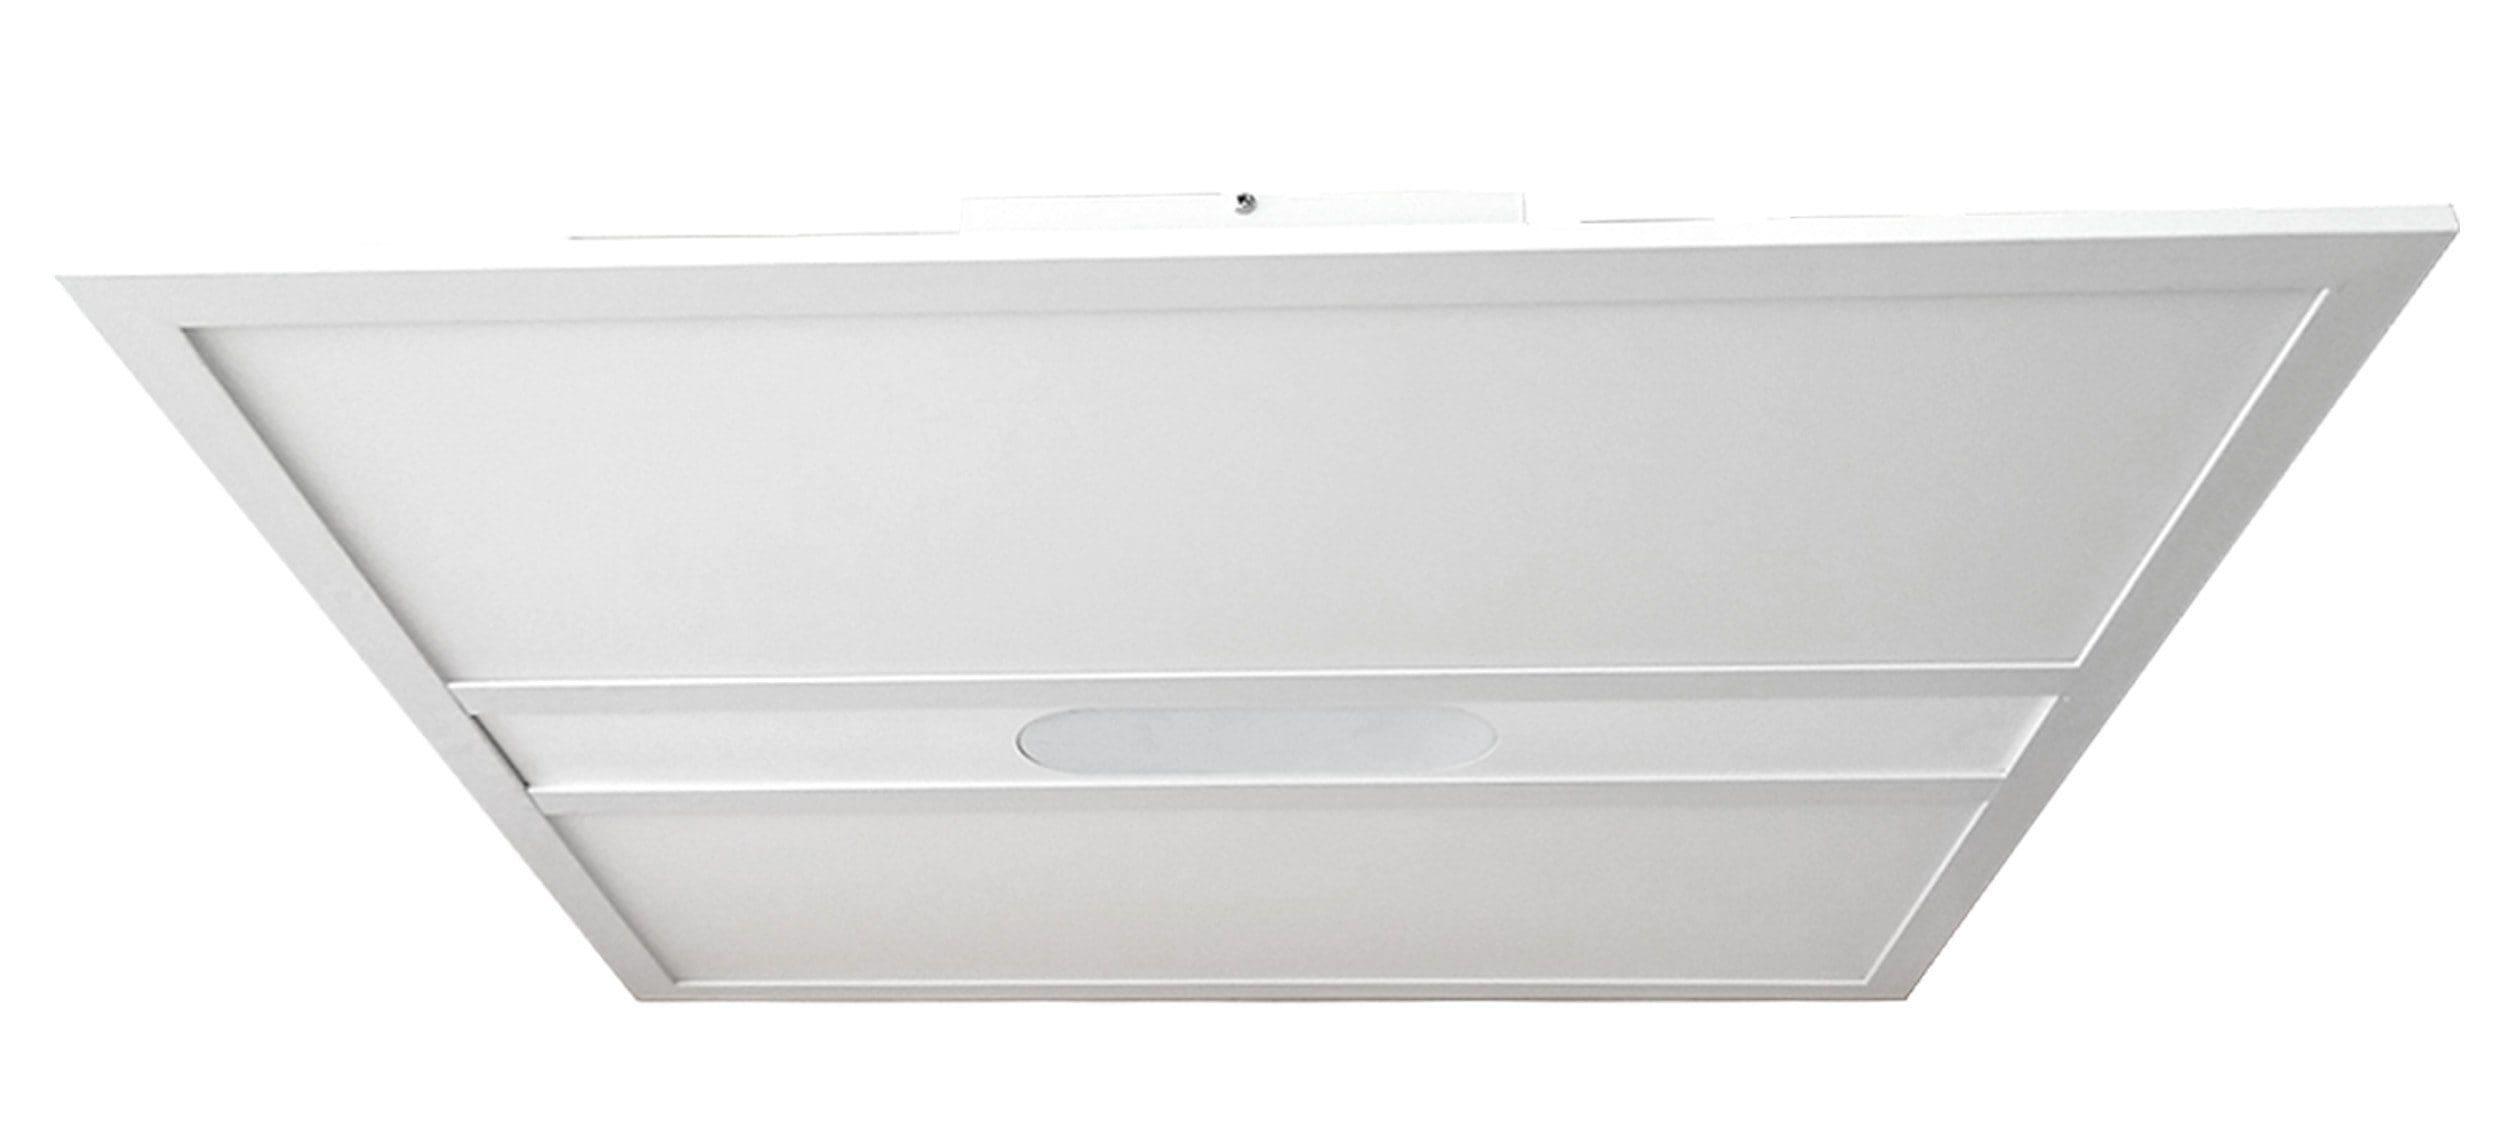 BreLight Mirius LED Deckenaufbau-Paneel 60x60cm weiß